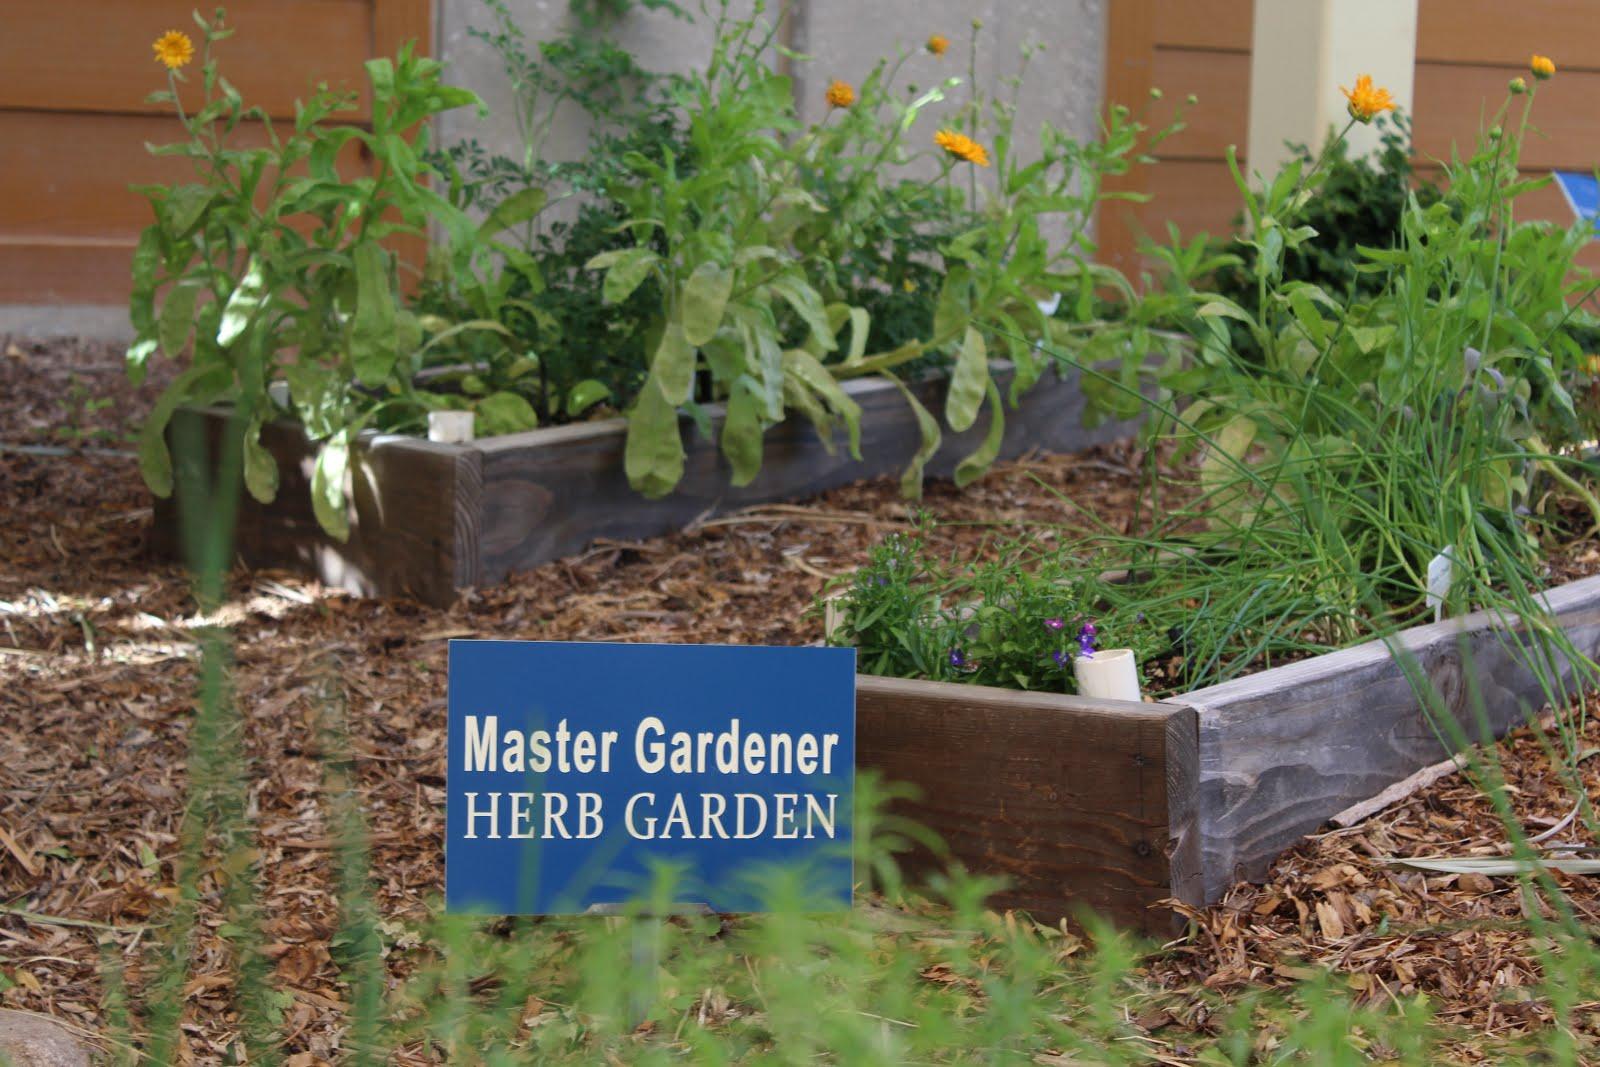 Star Nursery Blog: Stunning Herb Garden Ideas You'll Want ...